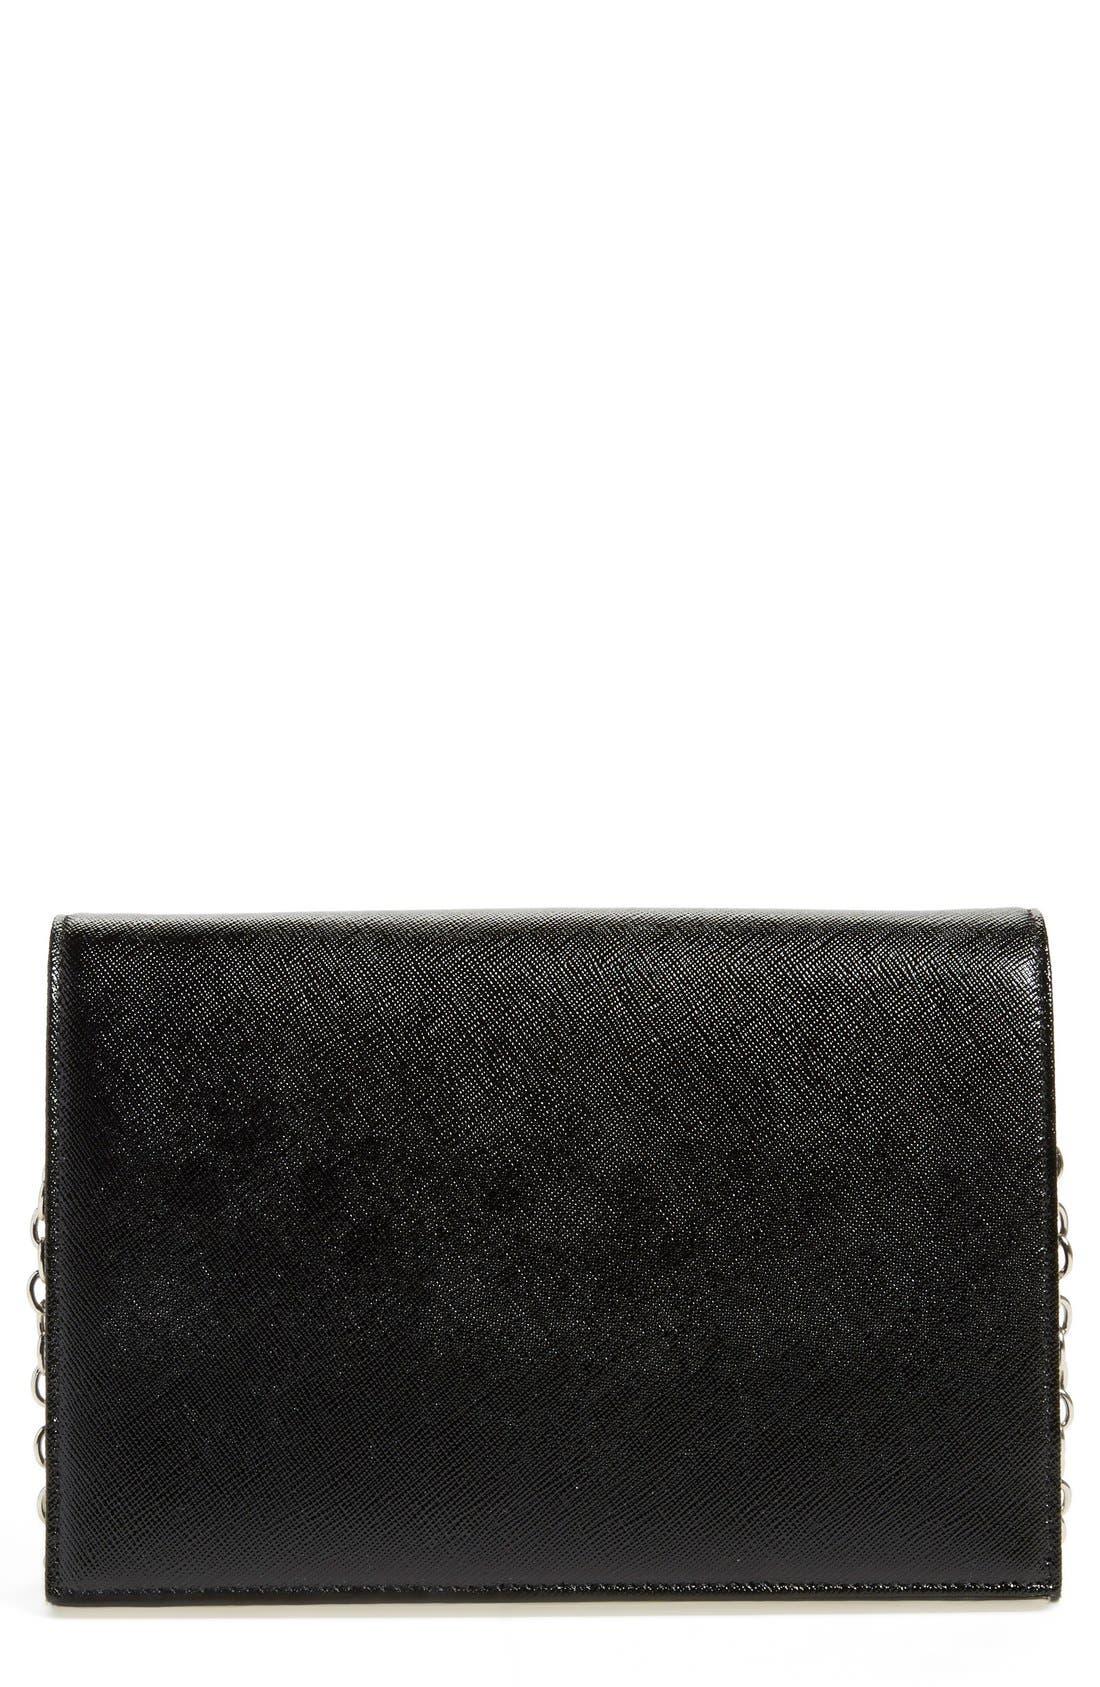 HALOGEN<SUP>®</SUP> 'Bar' Leather Crossbody Bag, Main, color, 001